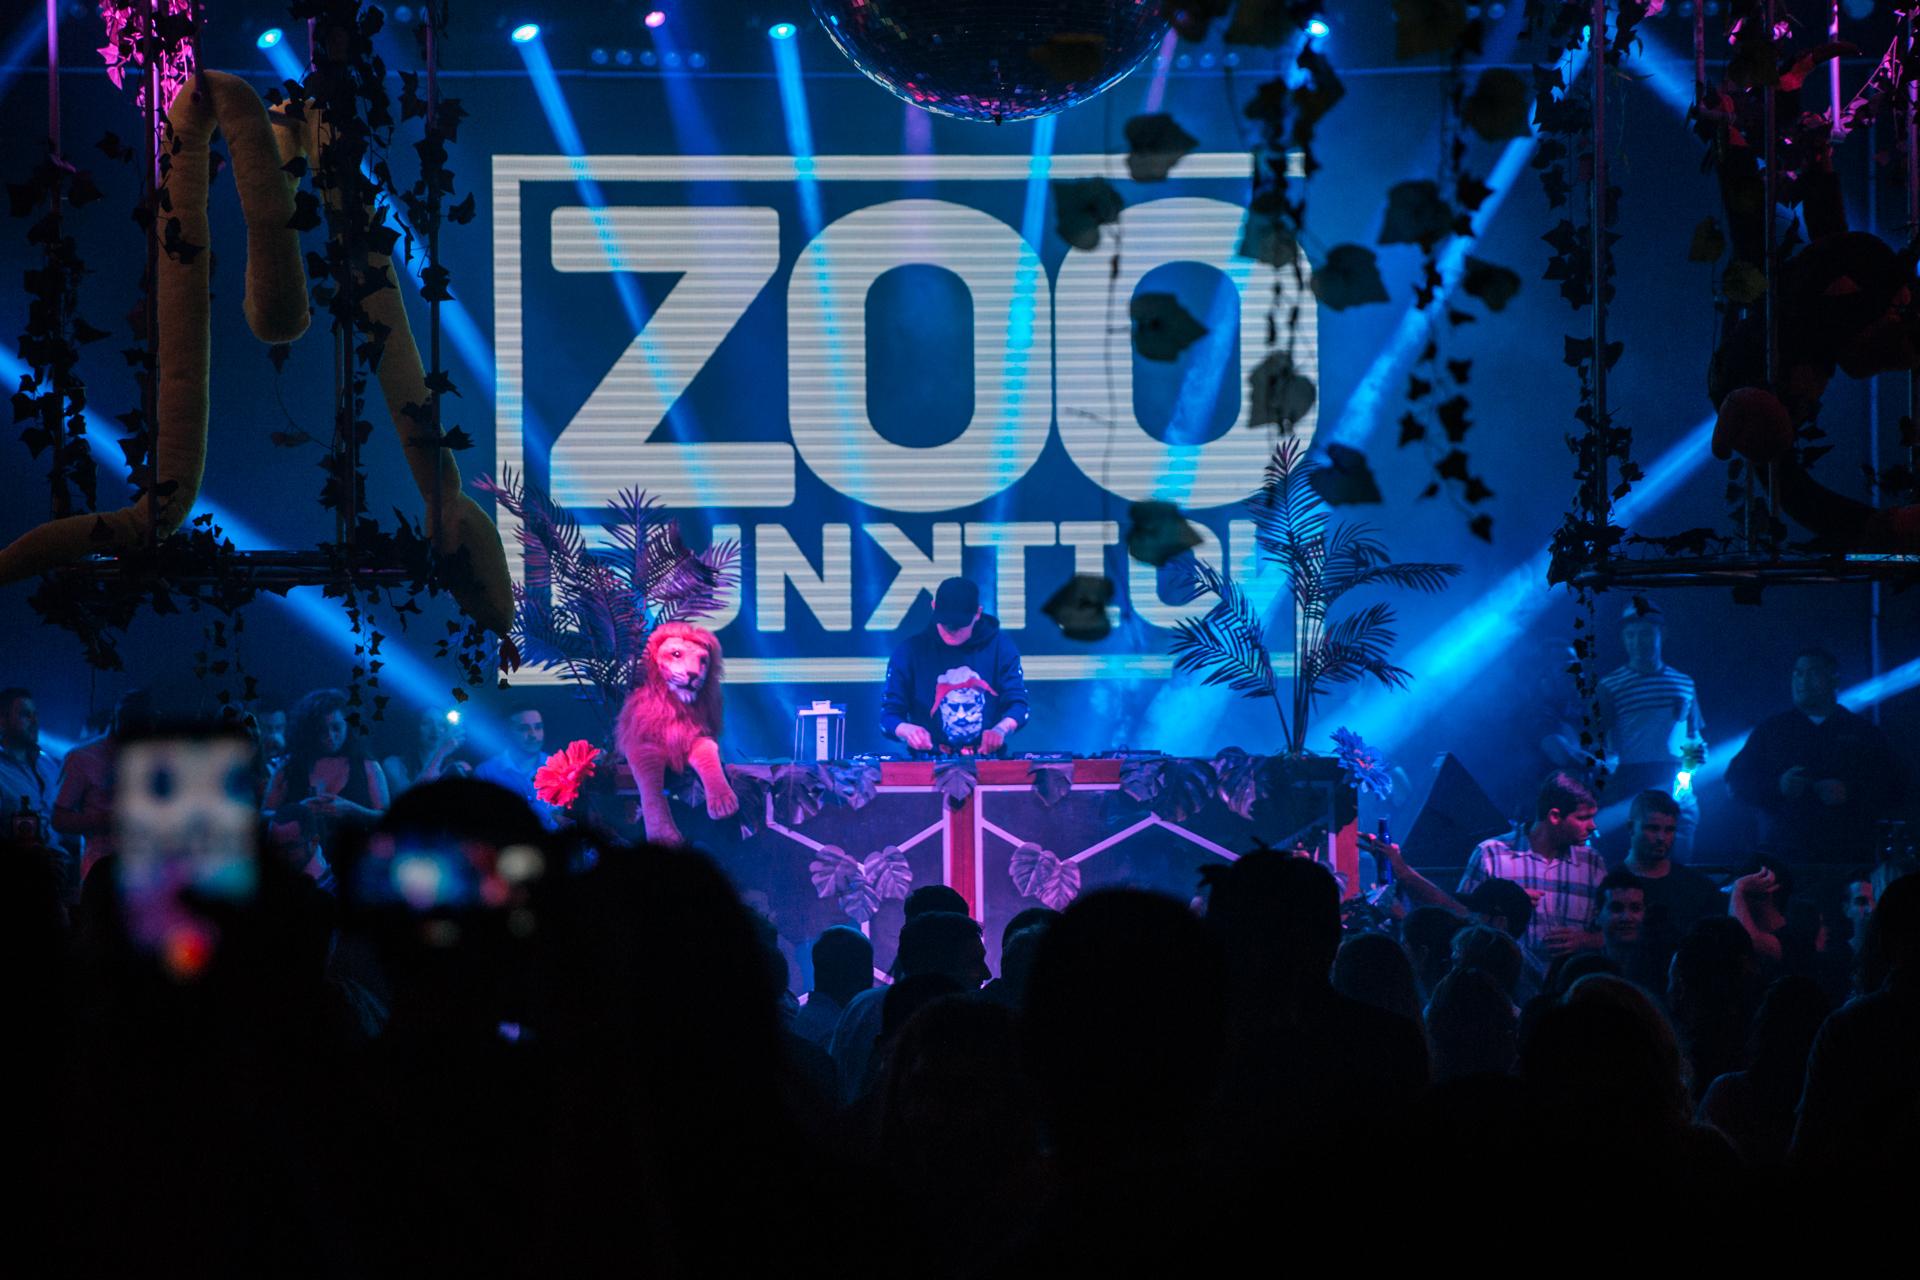 06.24.17 Zoo Funktion--1.jpg